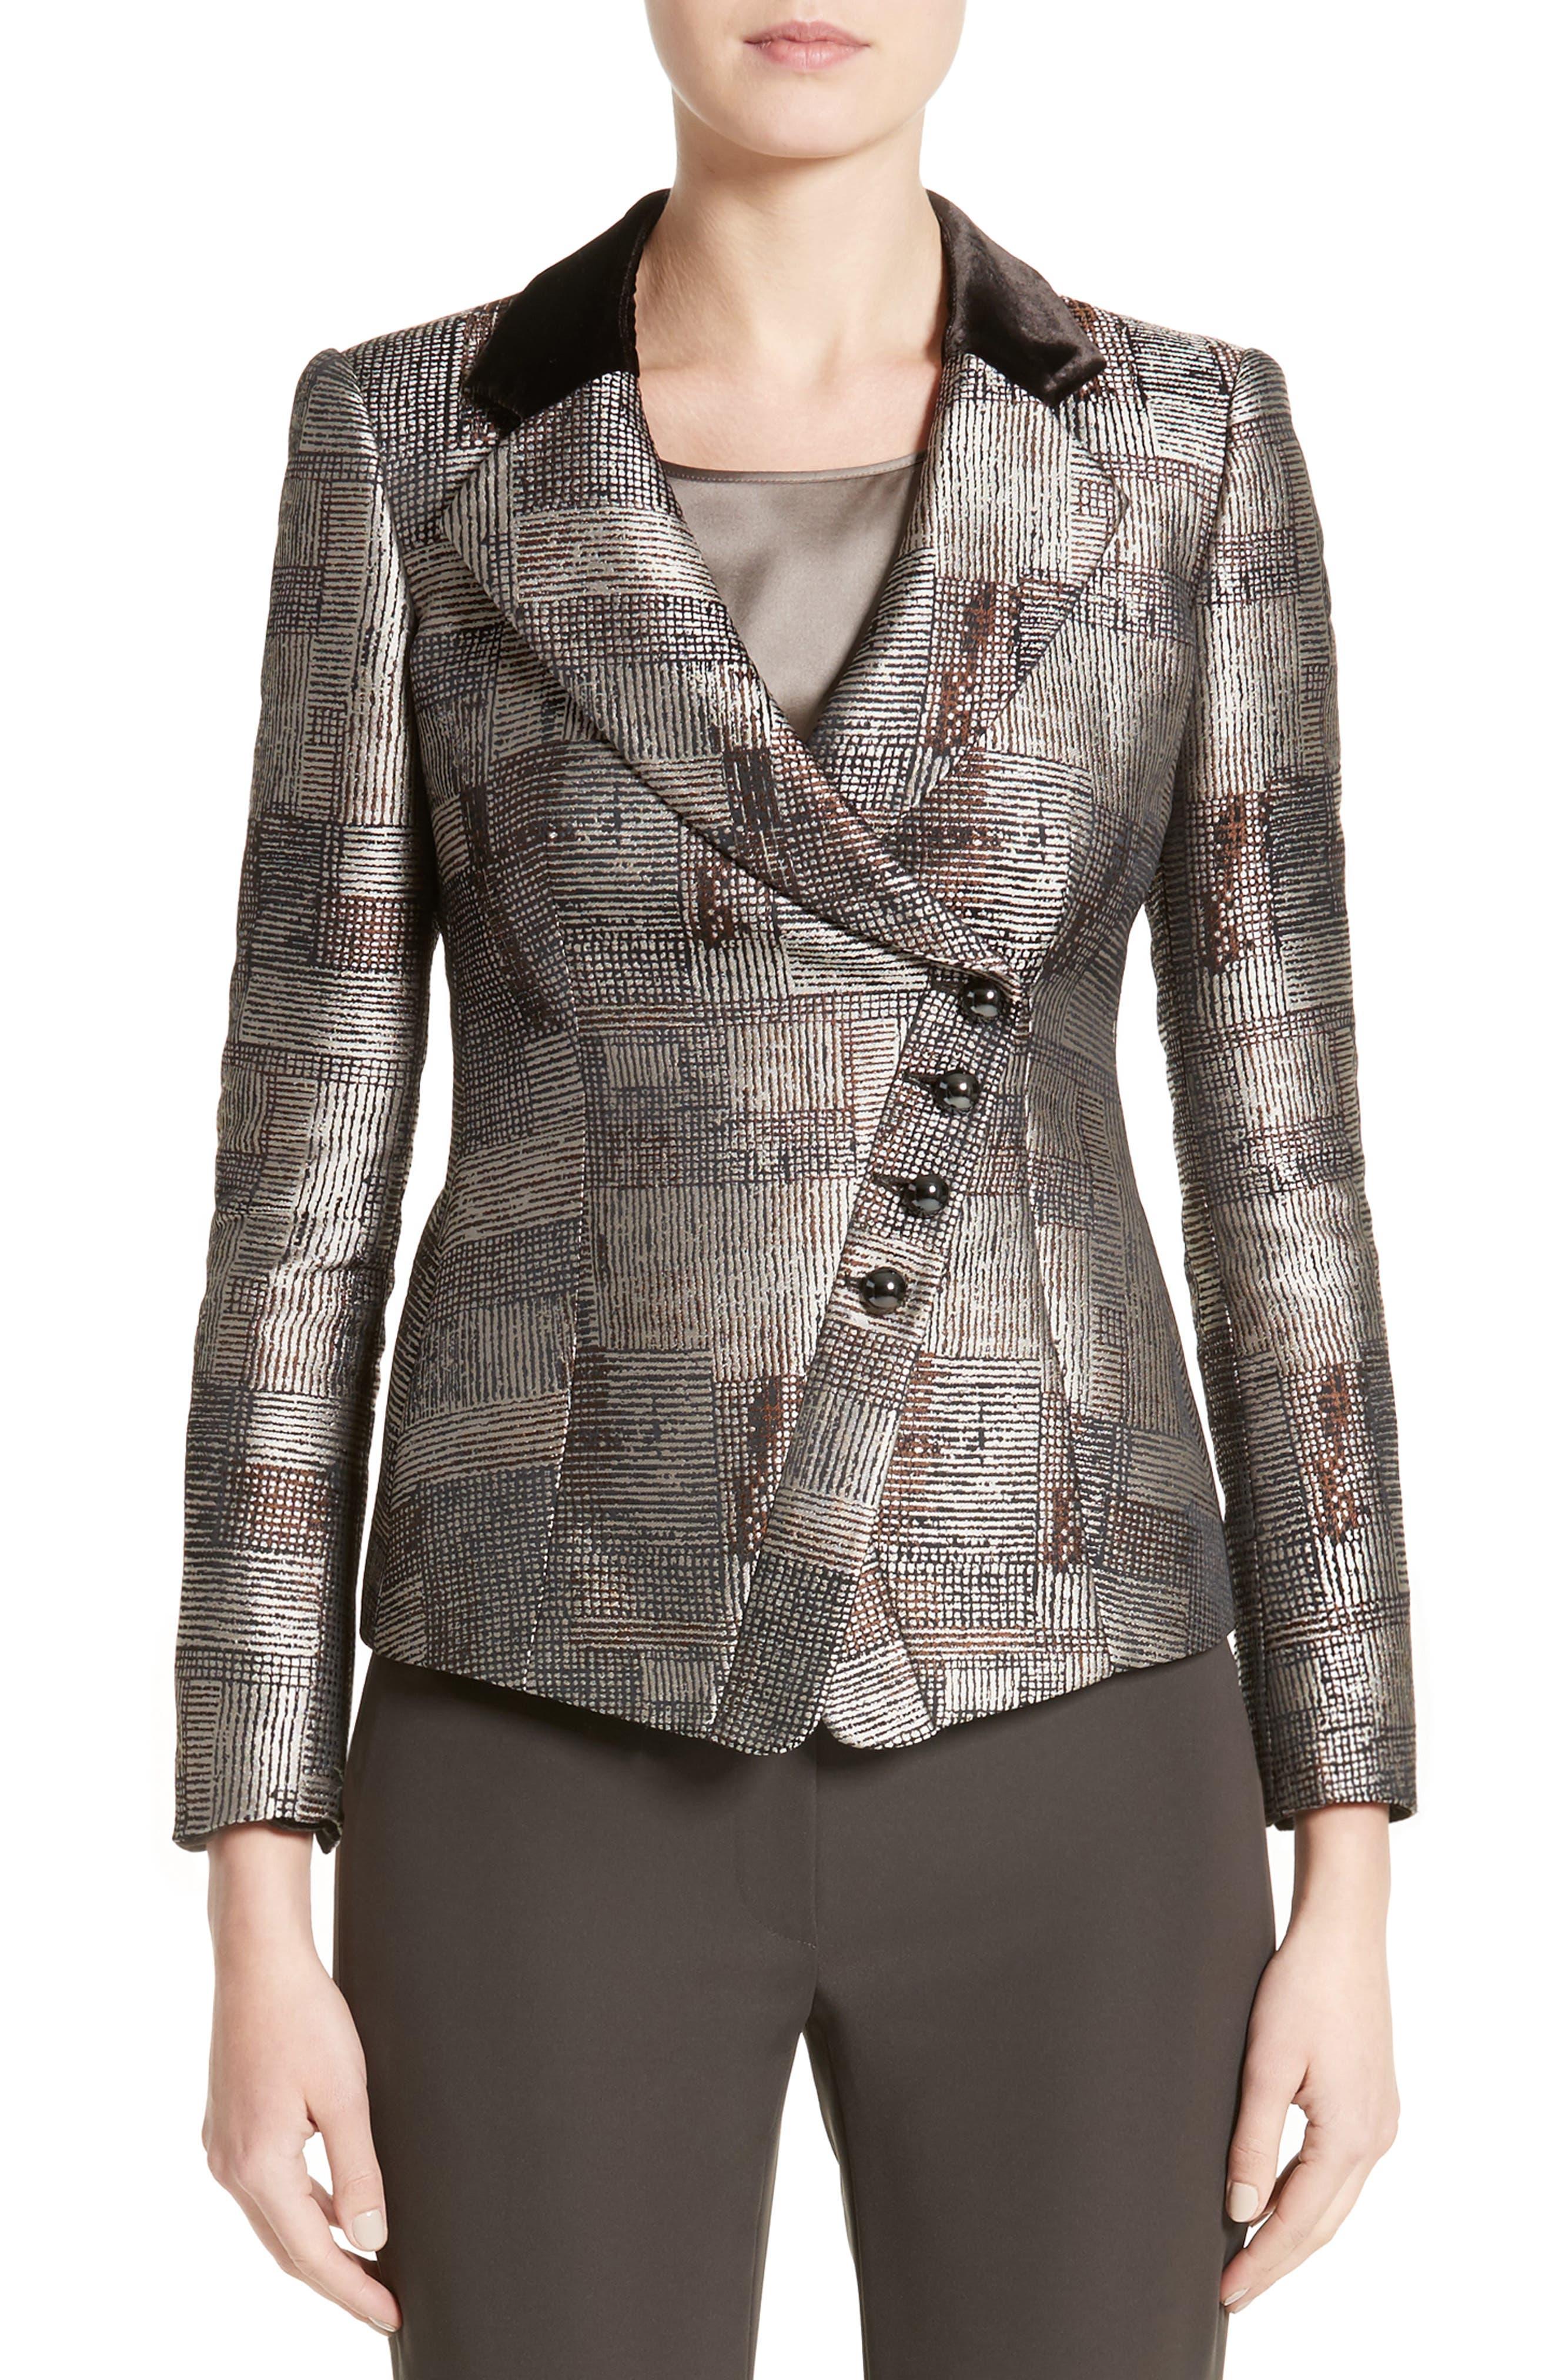 Panel Jacquard Asymmetrical Jacket,                             Main thumbnail 1, color,                             Multi